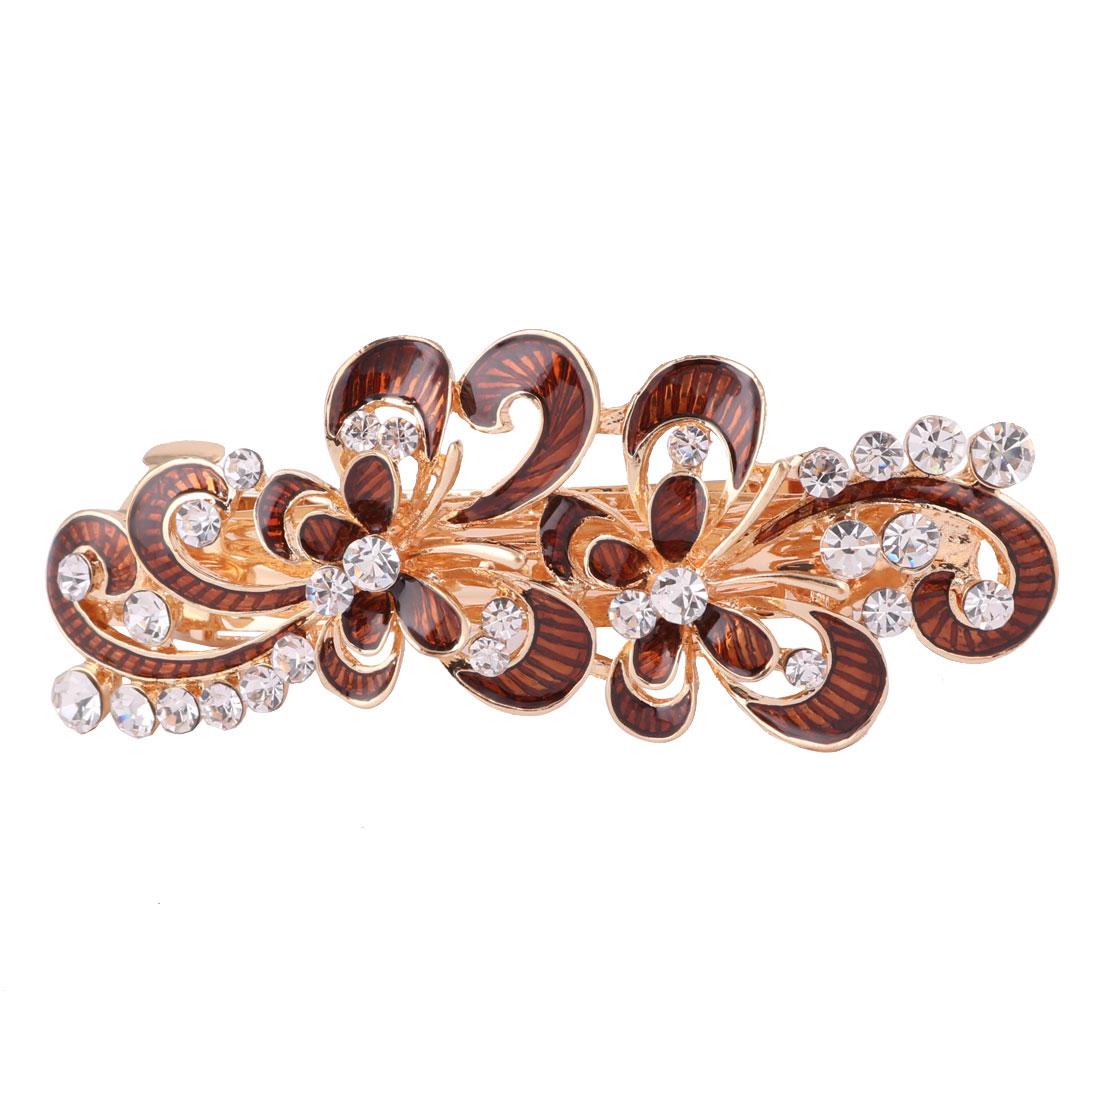 Ladies Metal Flower Design Faux Rhinestones Inlaid Hairstyle Hair Clip Coffee Color